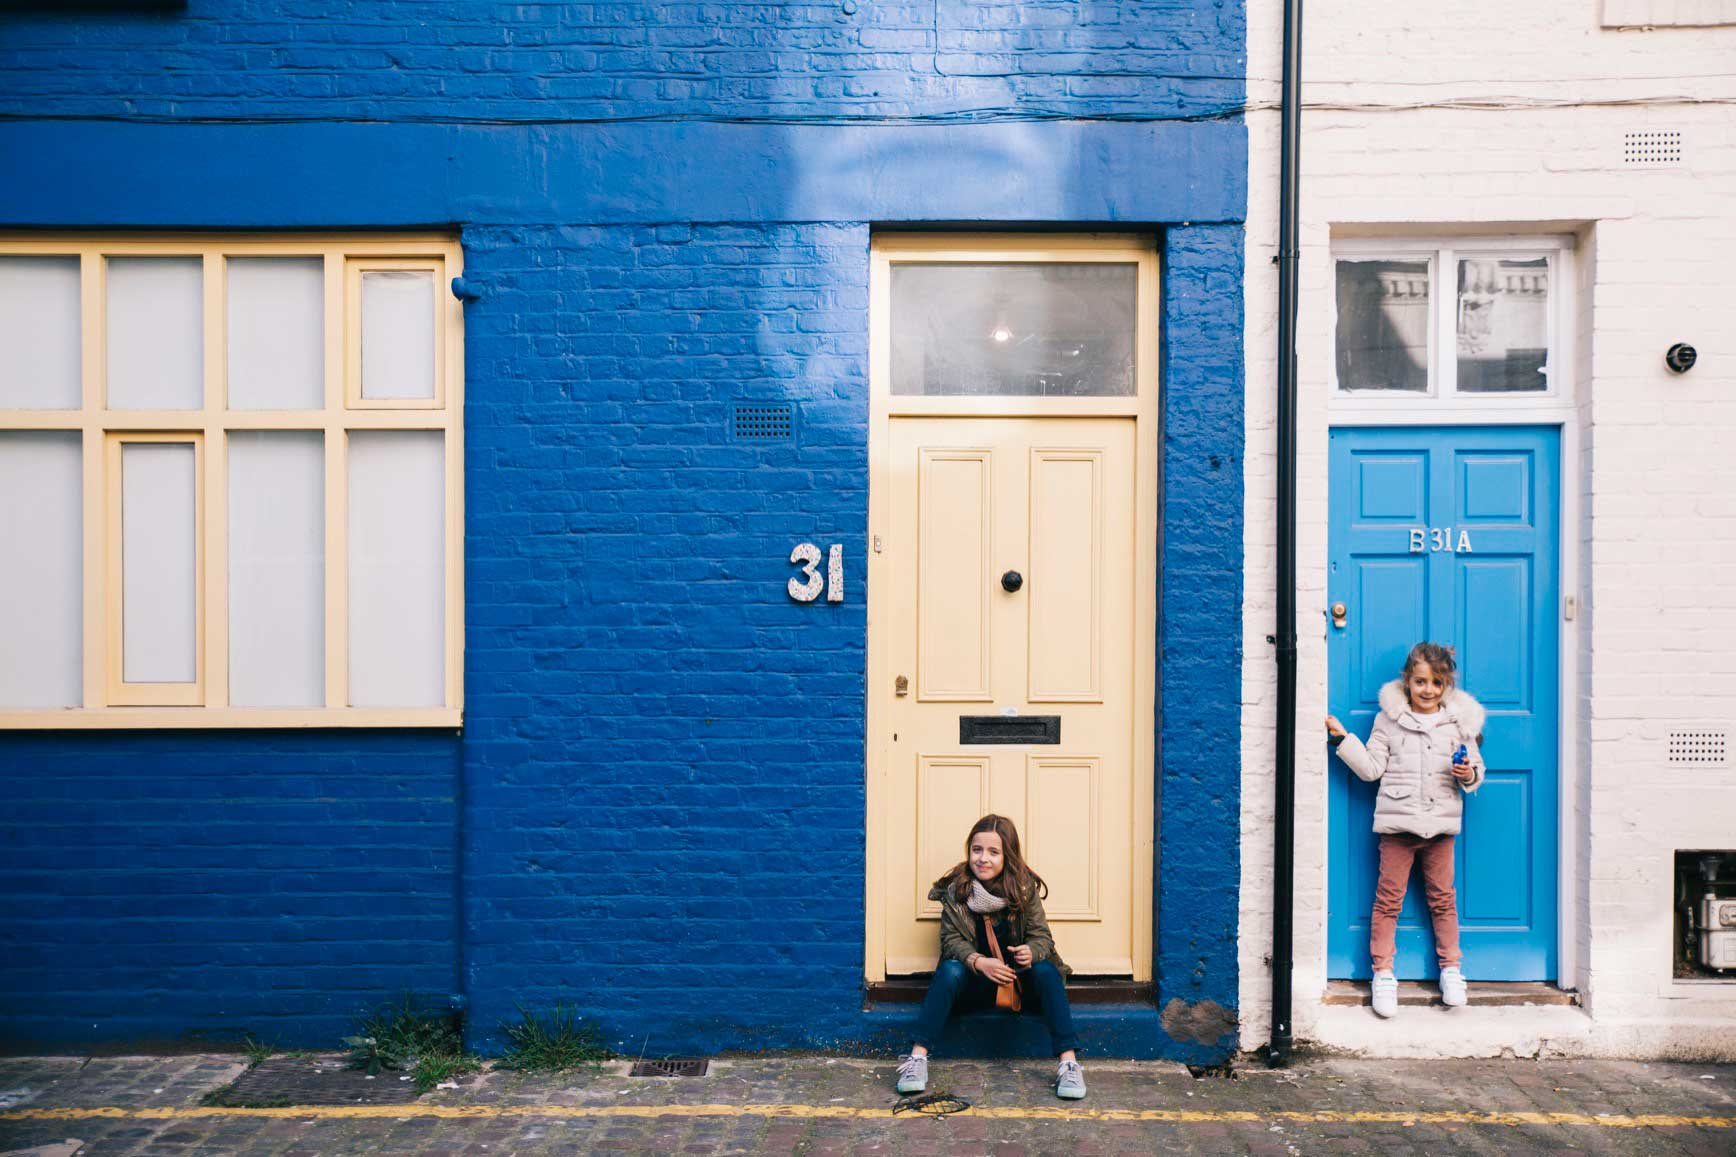 Lugares famosos para hacer fotos en Londres - Notting Hill